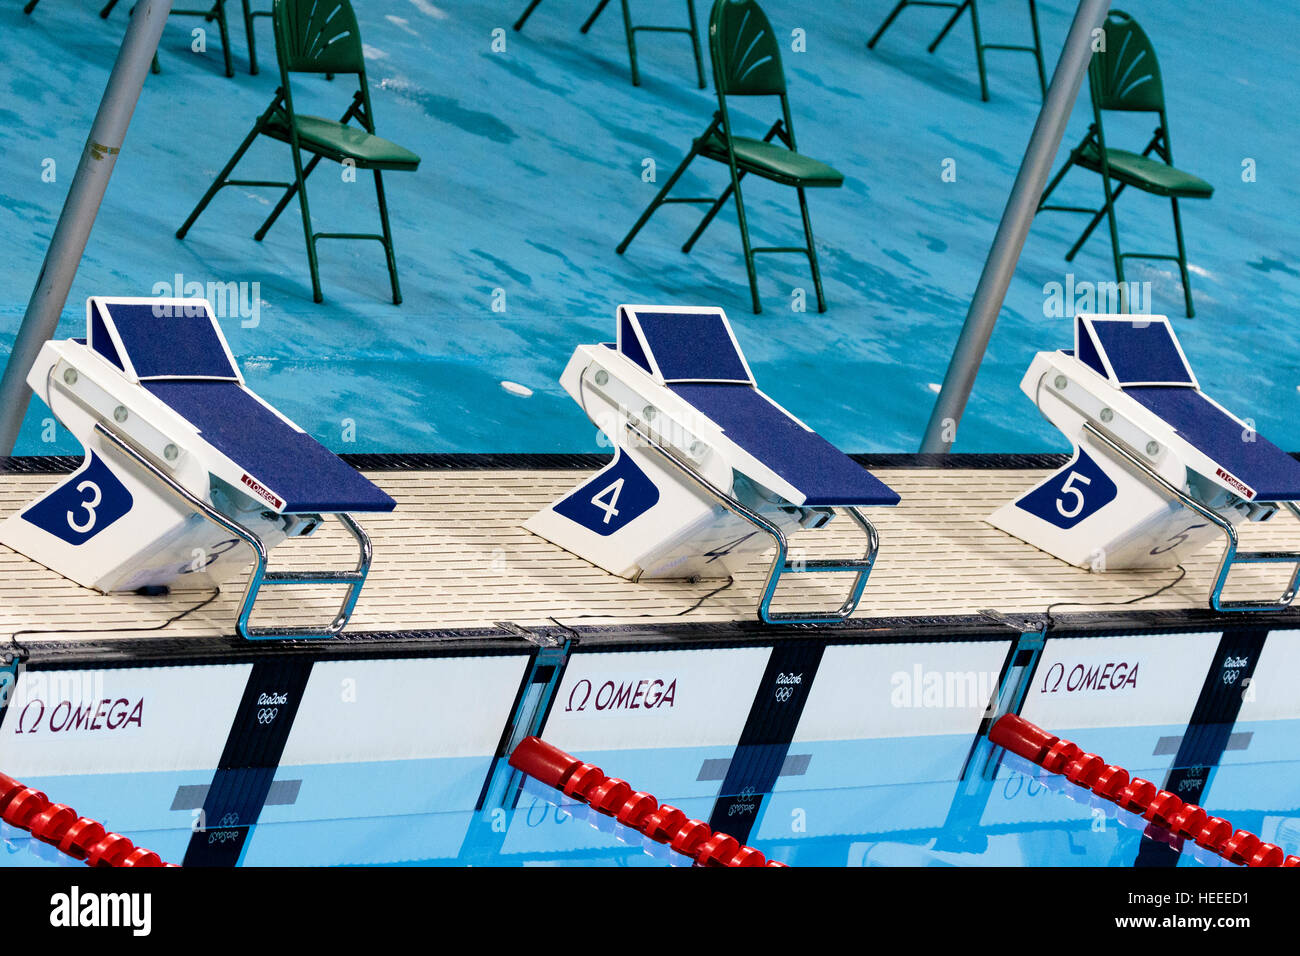 Swimming starting blocks - Stock Image